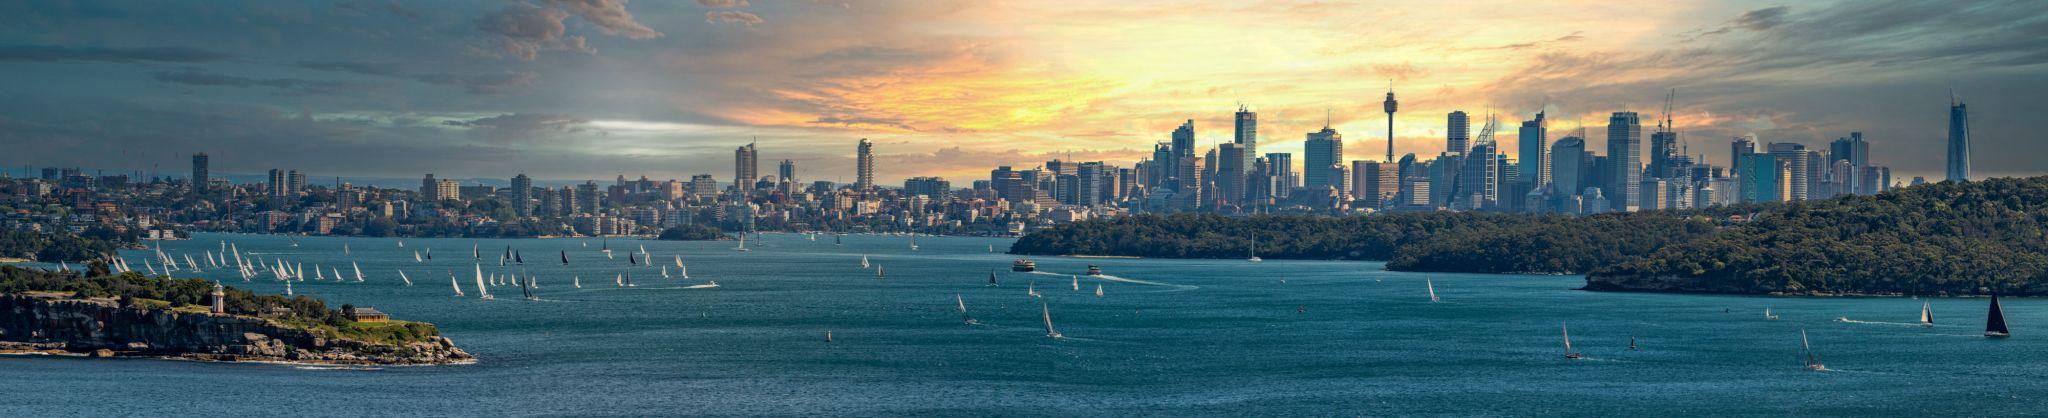 Sydney sunset, North Head New South Wales, Australia